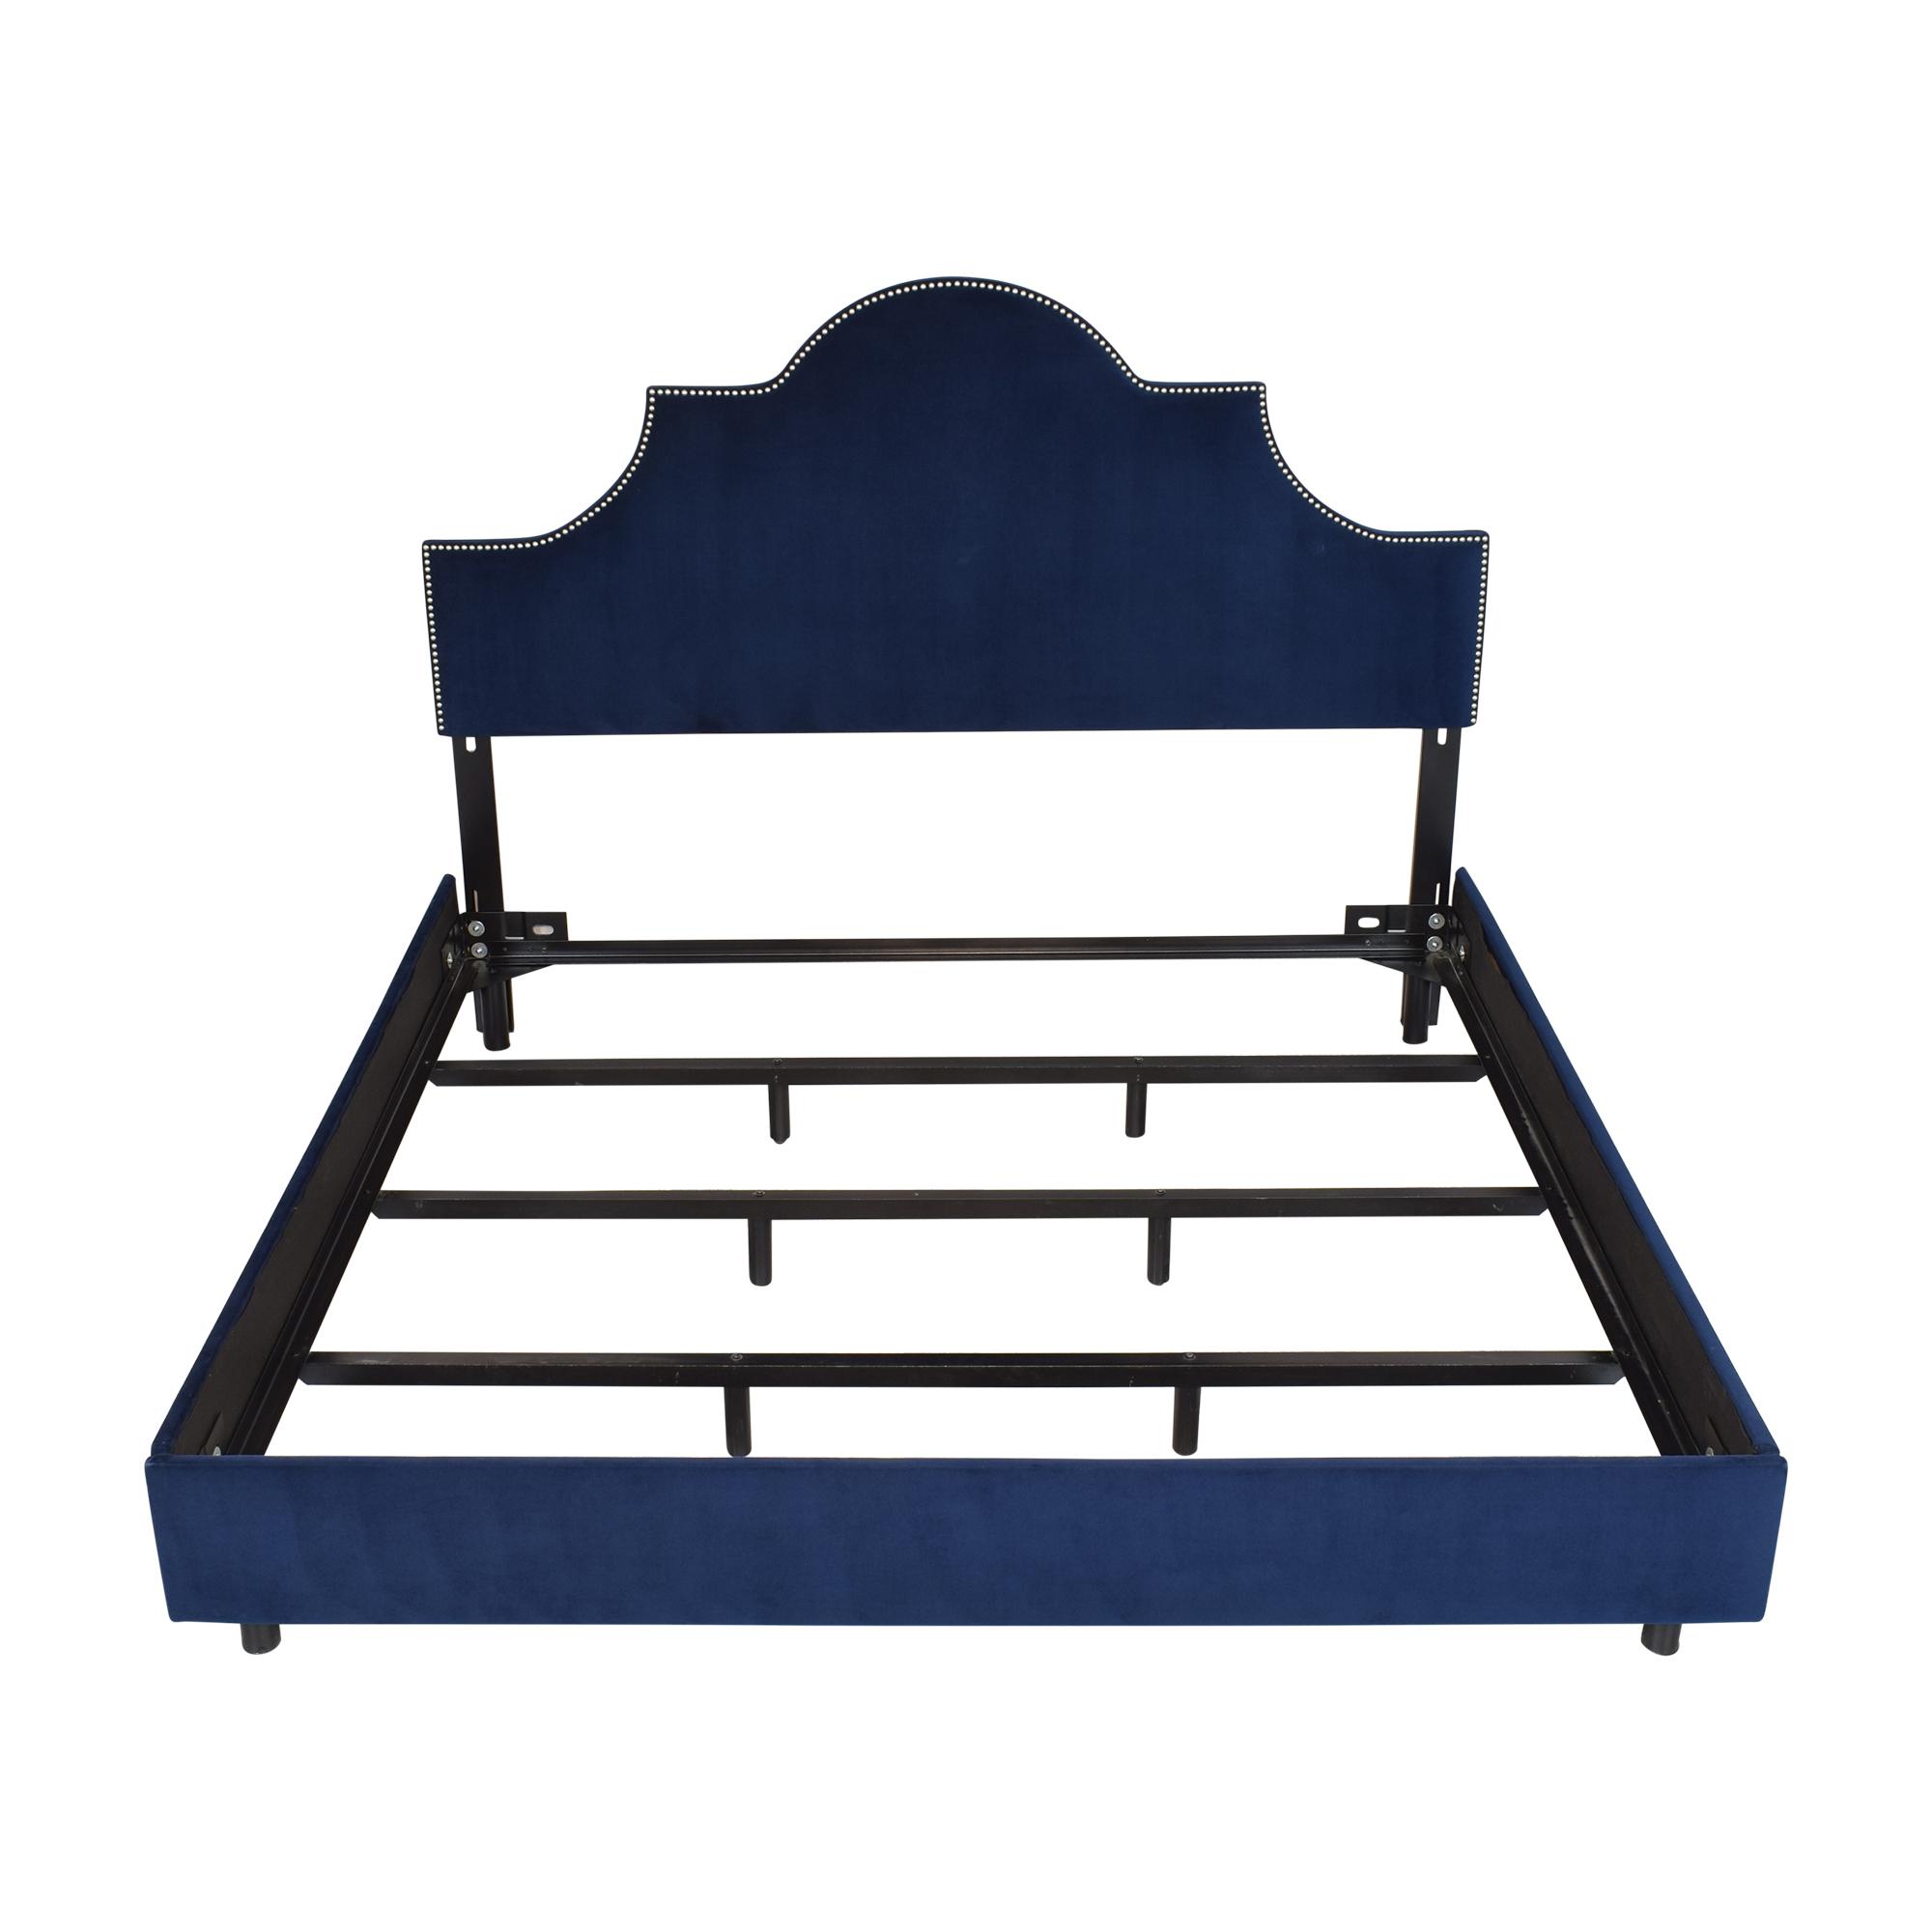 Skyline Furniture Skyline Nailhead King Bed with Headboard second hand